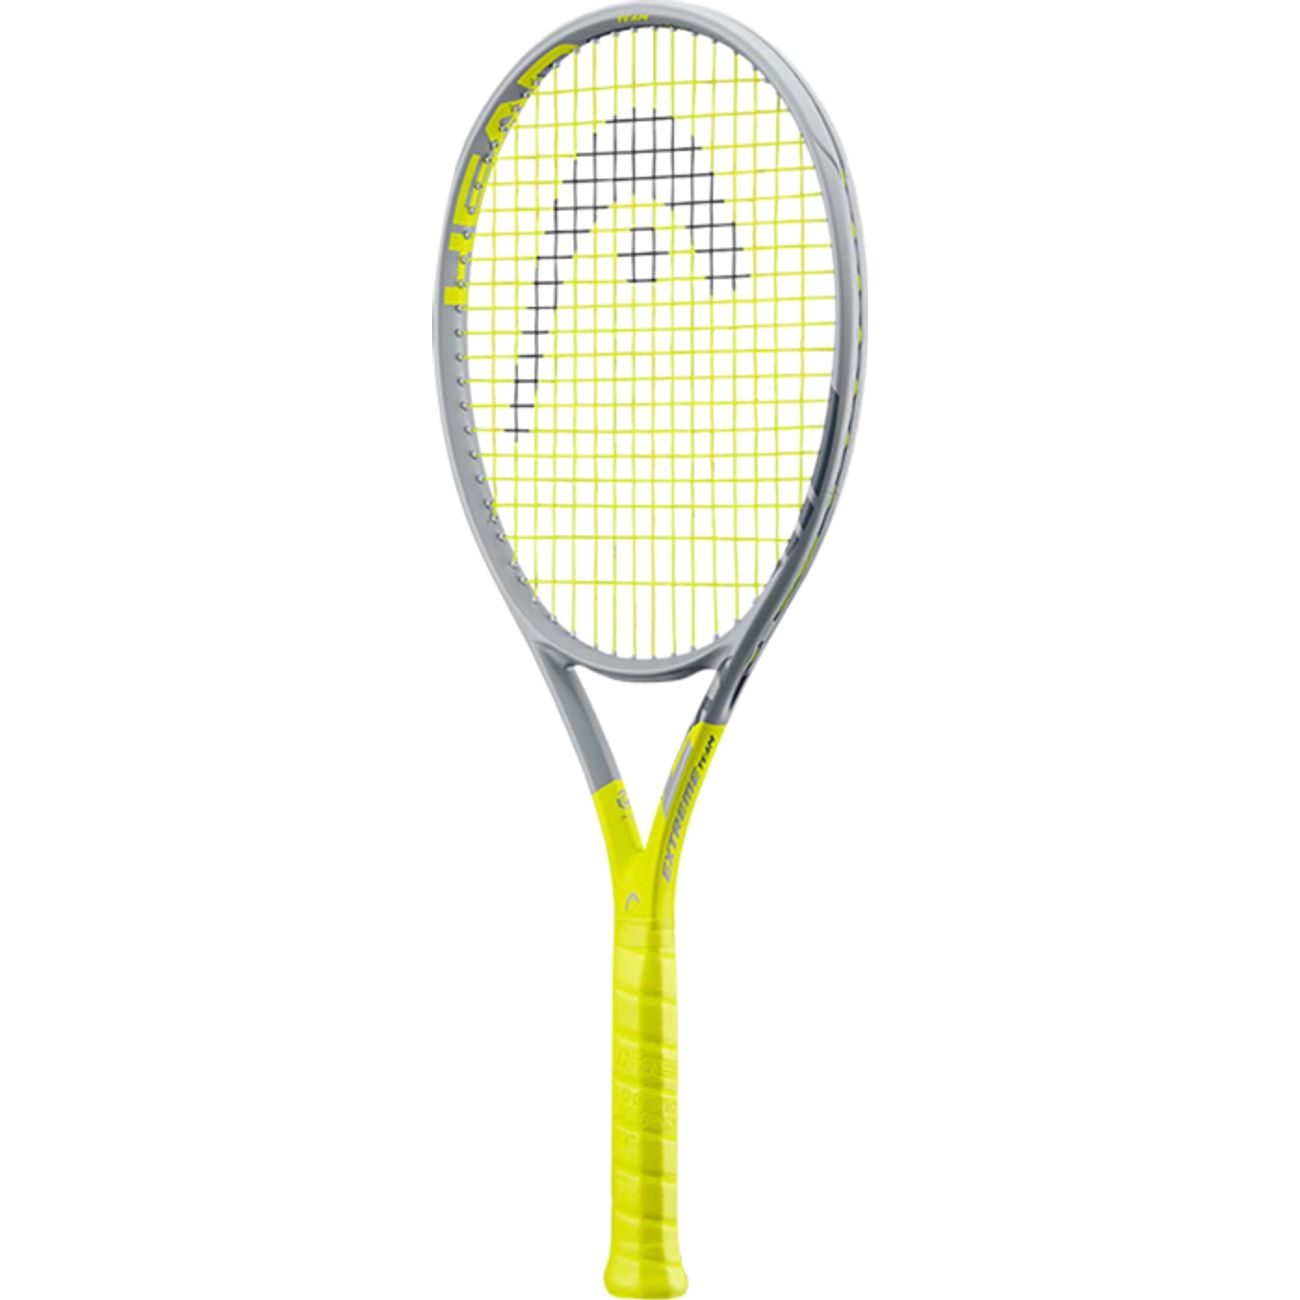 RAQUETTES A NEIGE Tennis mixte HEAD EXTREME TEAM